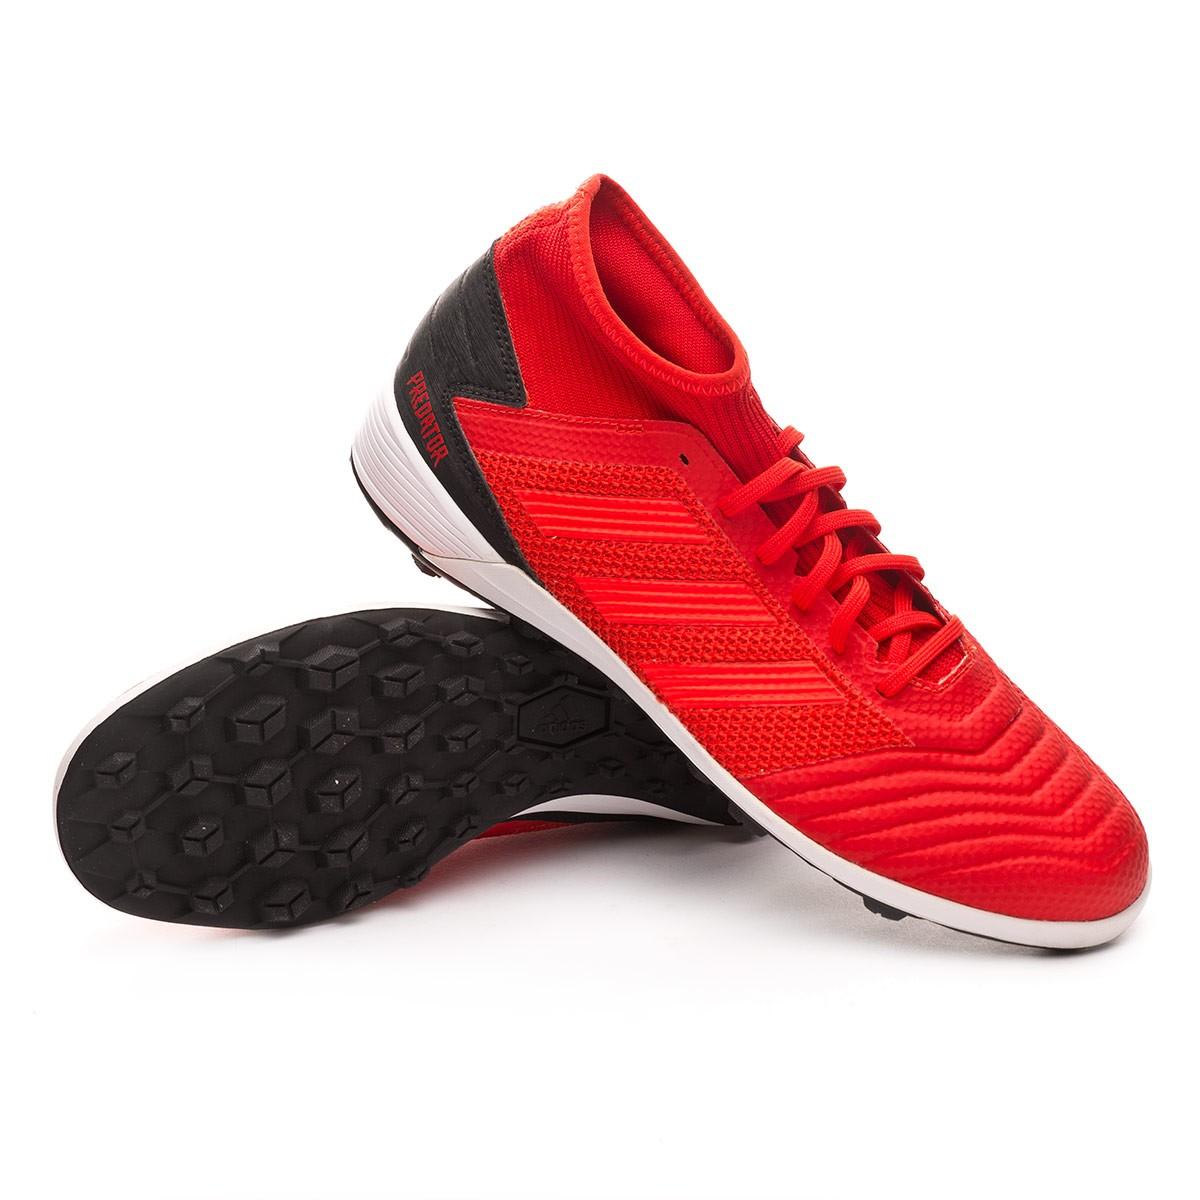 5605947bdd4eb Sapatilhas adidas Predator Tango 19.3 Turf Active red-Solar red-Core black  - Loja de futebol Fútbol Emotion